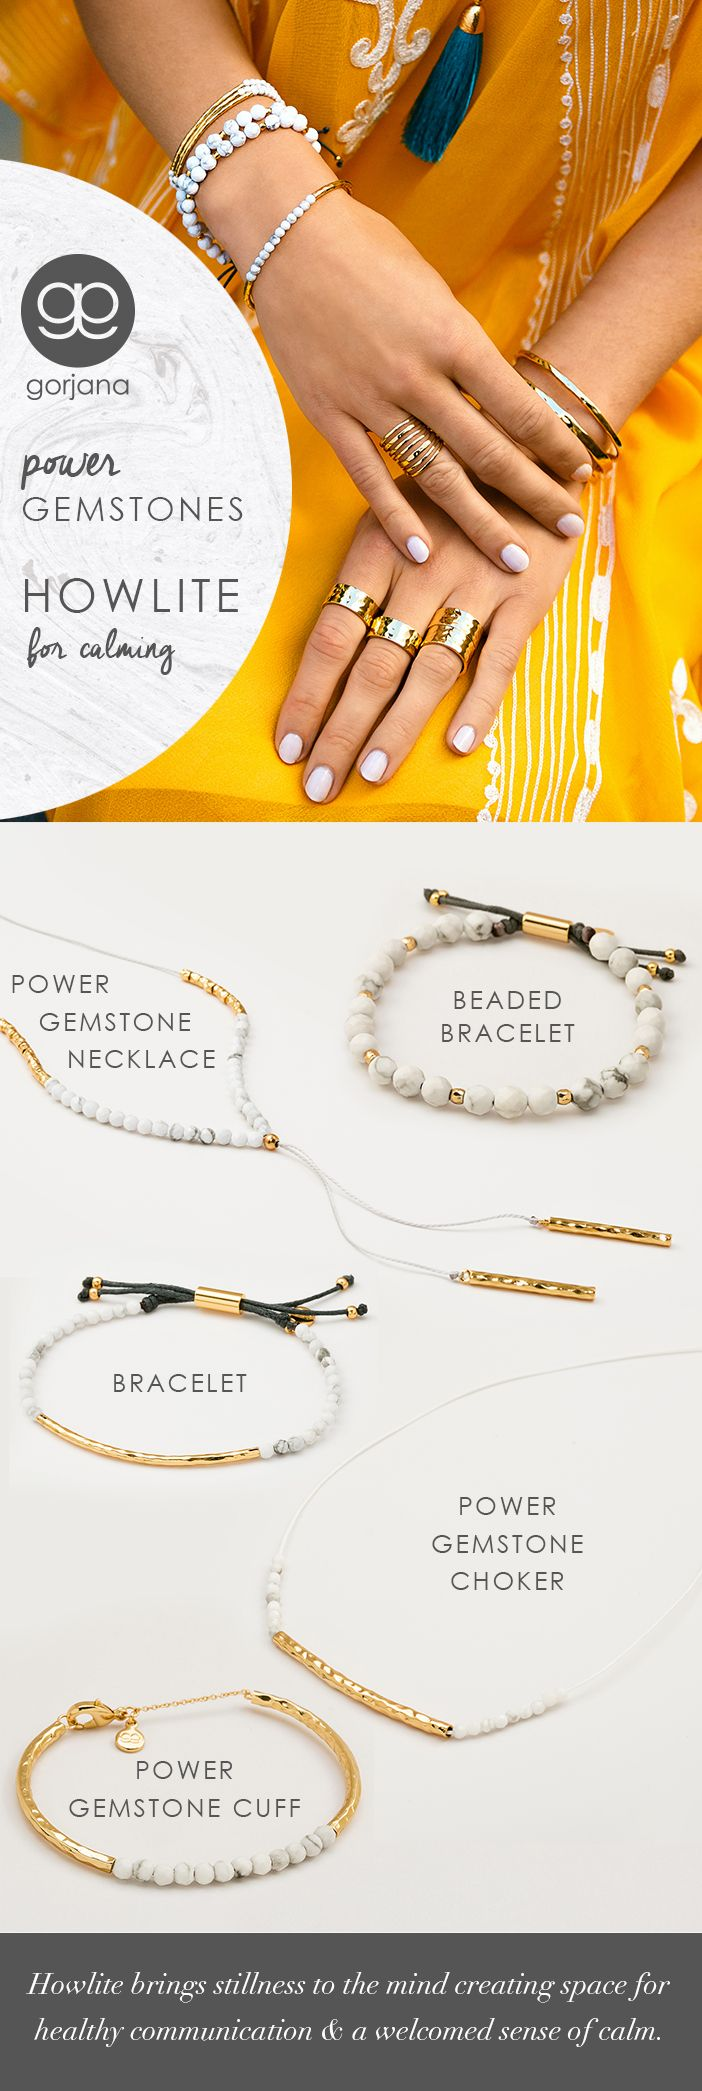 Power Gemstone | Gorjana